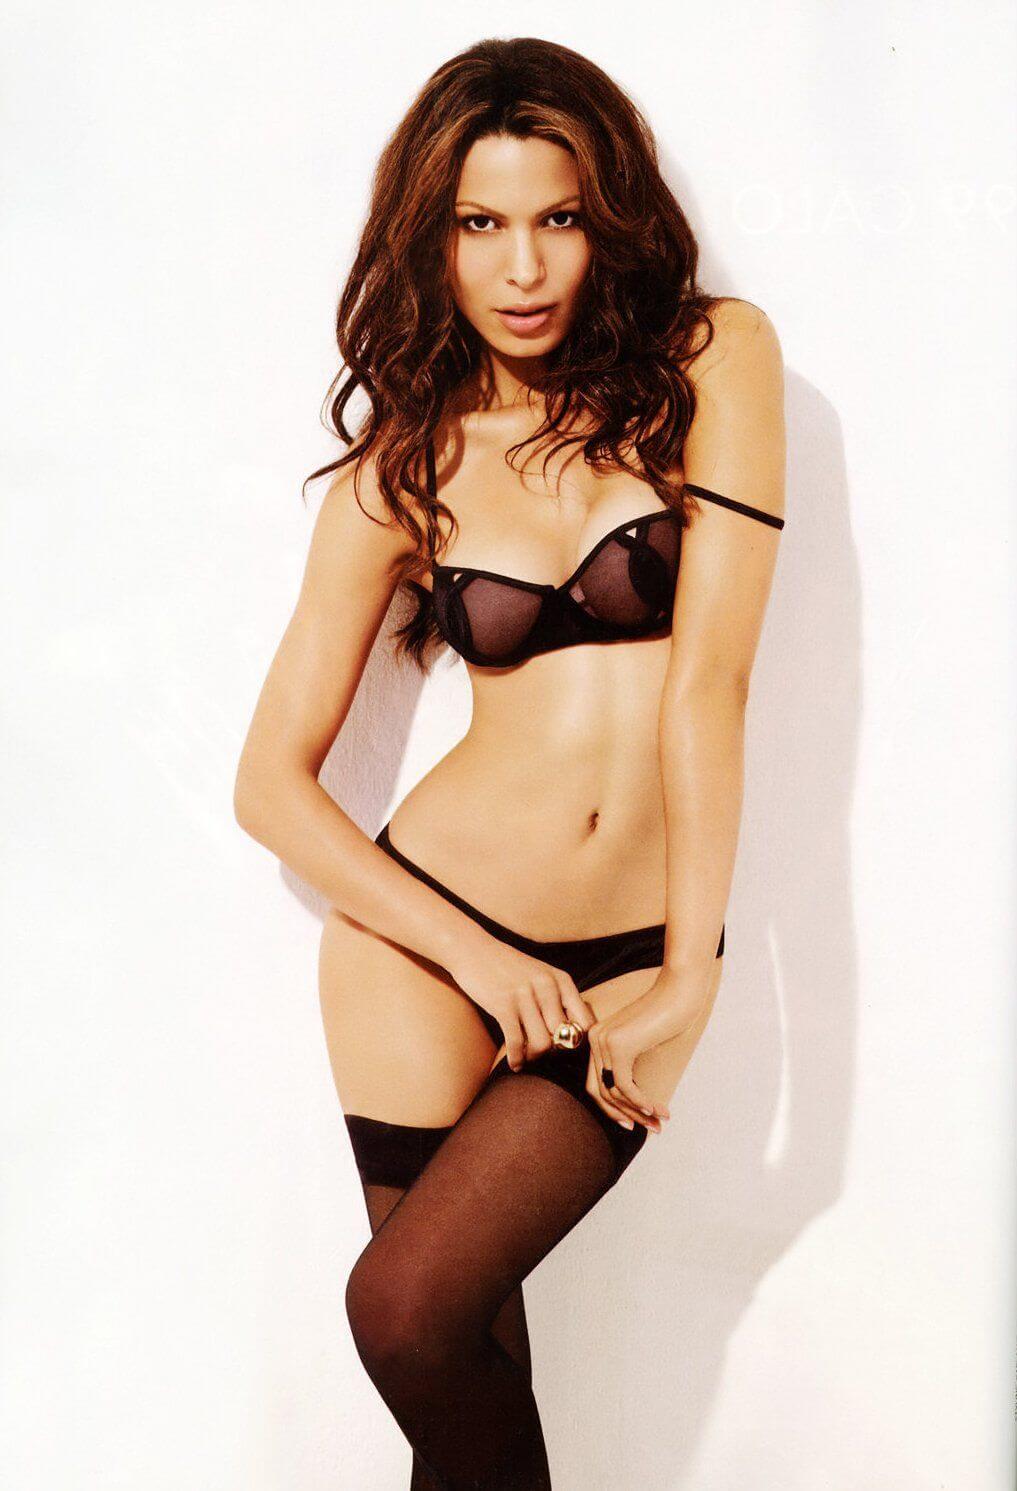 The Hottest Nadine Velazquez Photos - 12thBlog